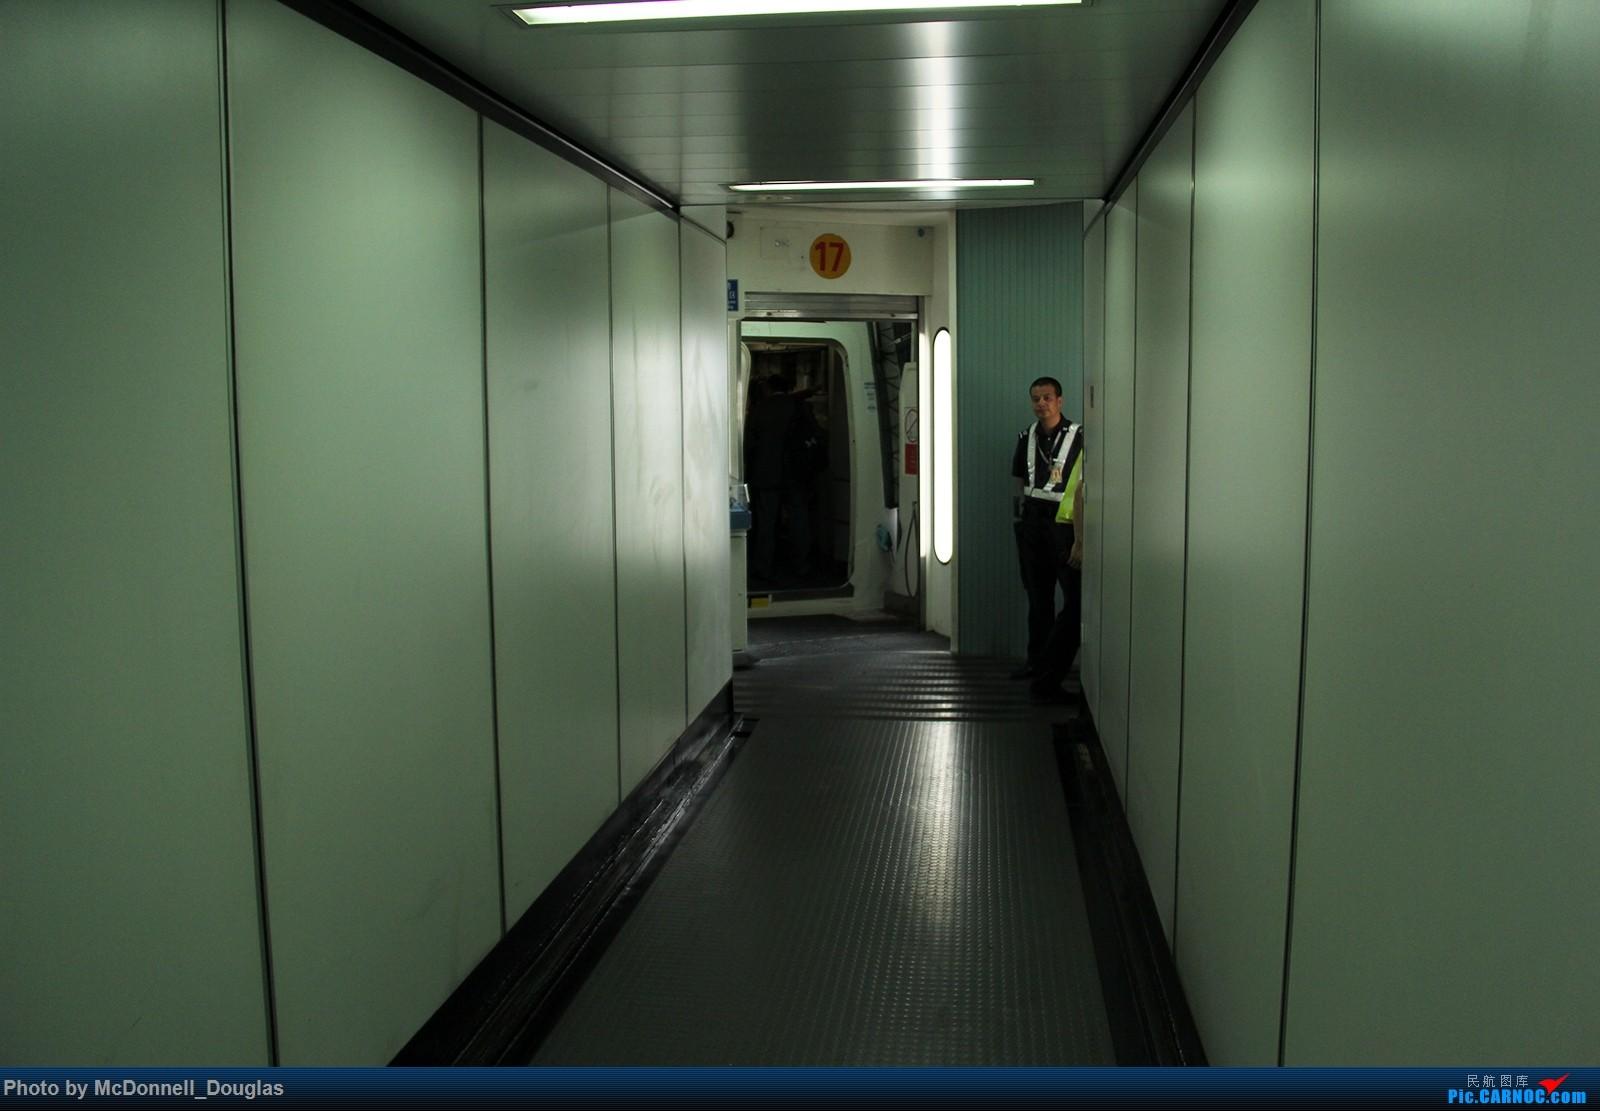 Re:[原创]【上海飞友会】图会很多,也有很多驾驶舱,杂七杂八的美帝,梦寐以求的圣马丁,这更绝不弃贴,前十个id砸飞机砸一个返一个    中国上海浦东国际机场